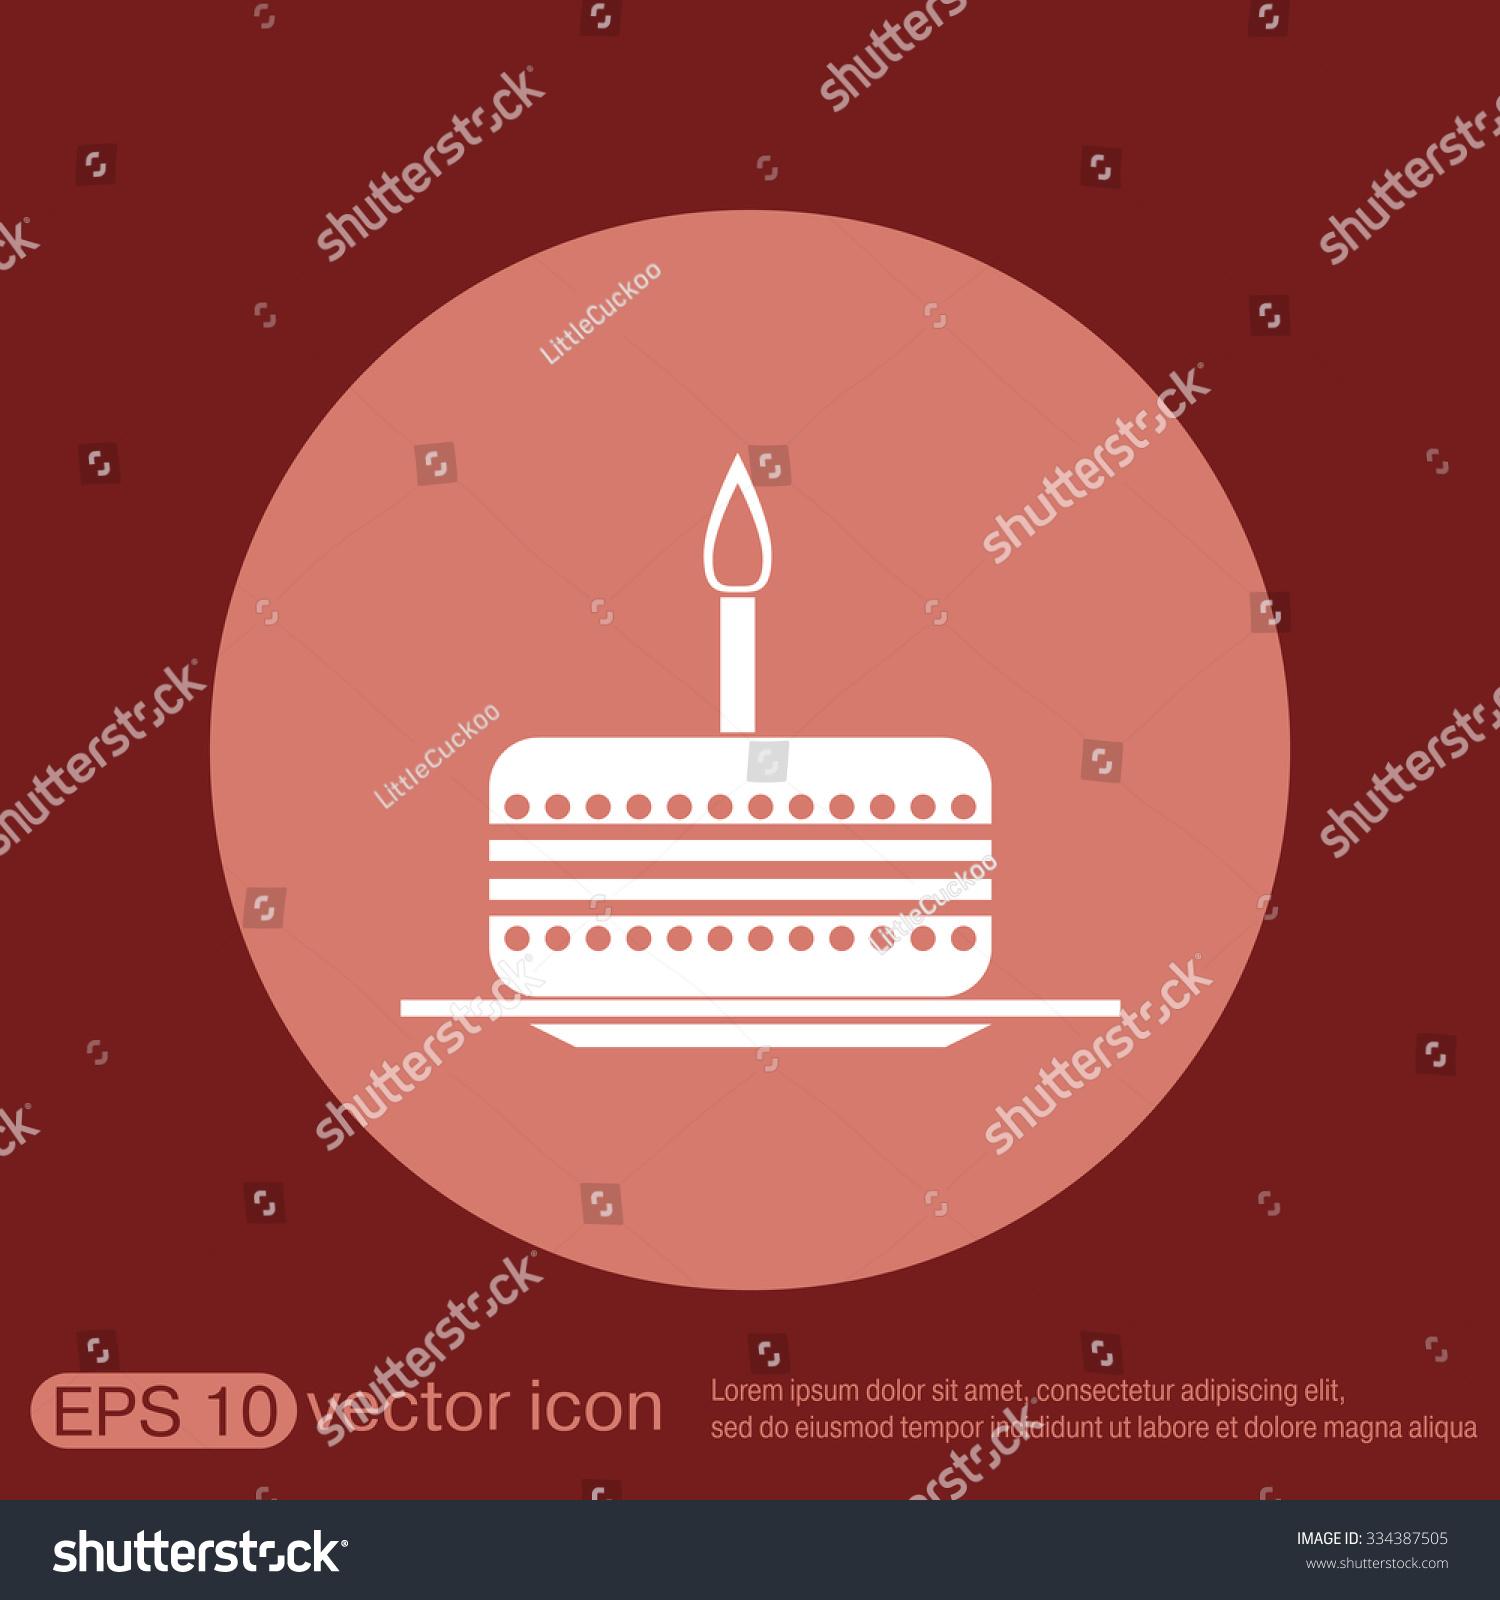 birthday cake icon. symbol of cake. Celebrating the birthday of the ...